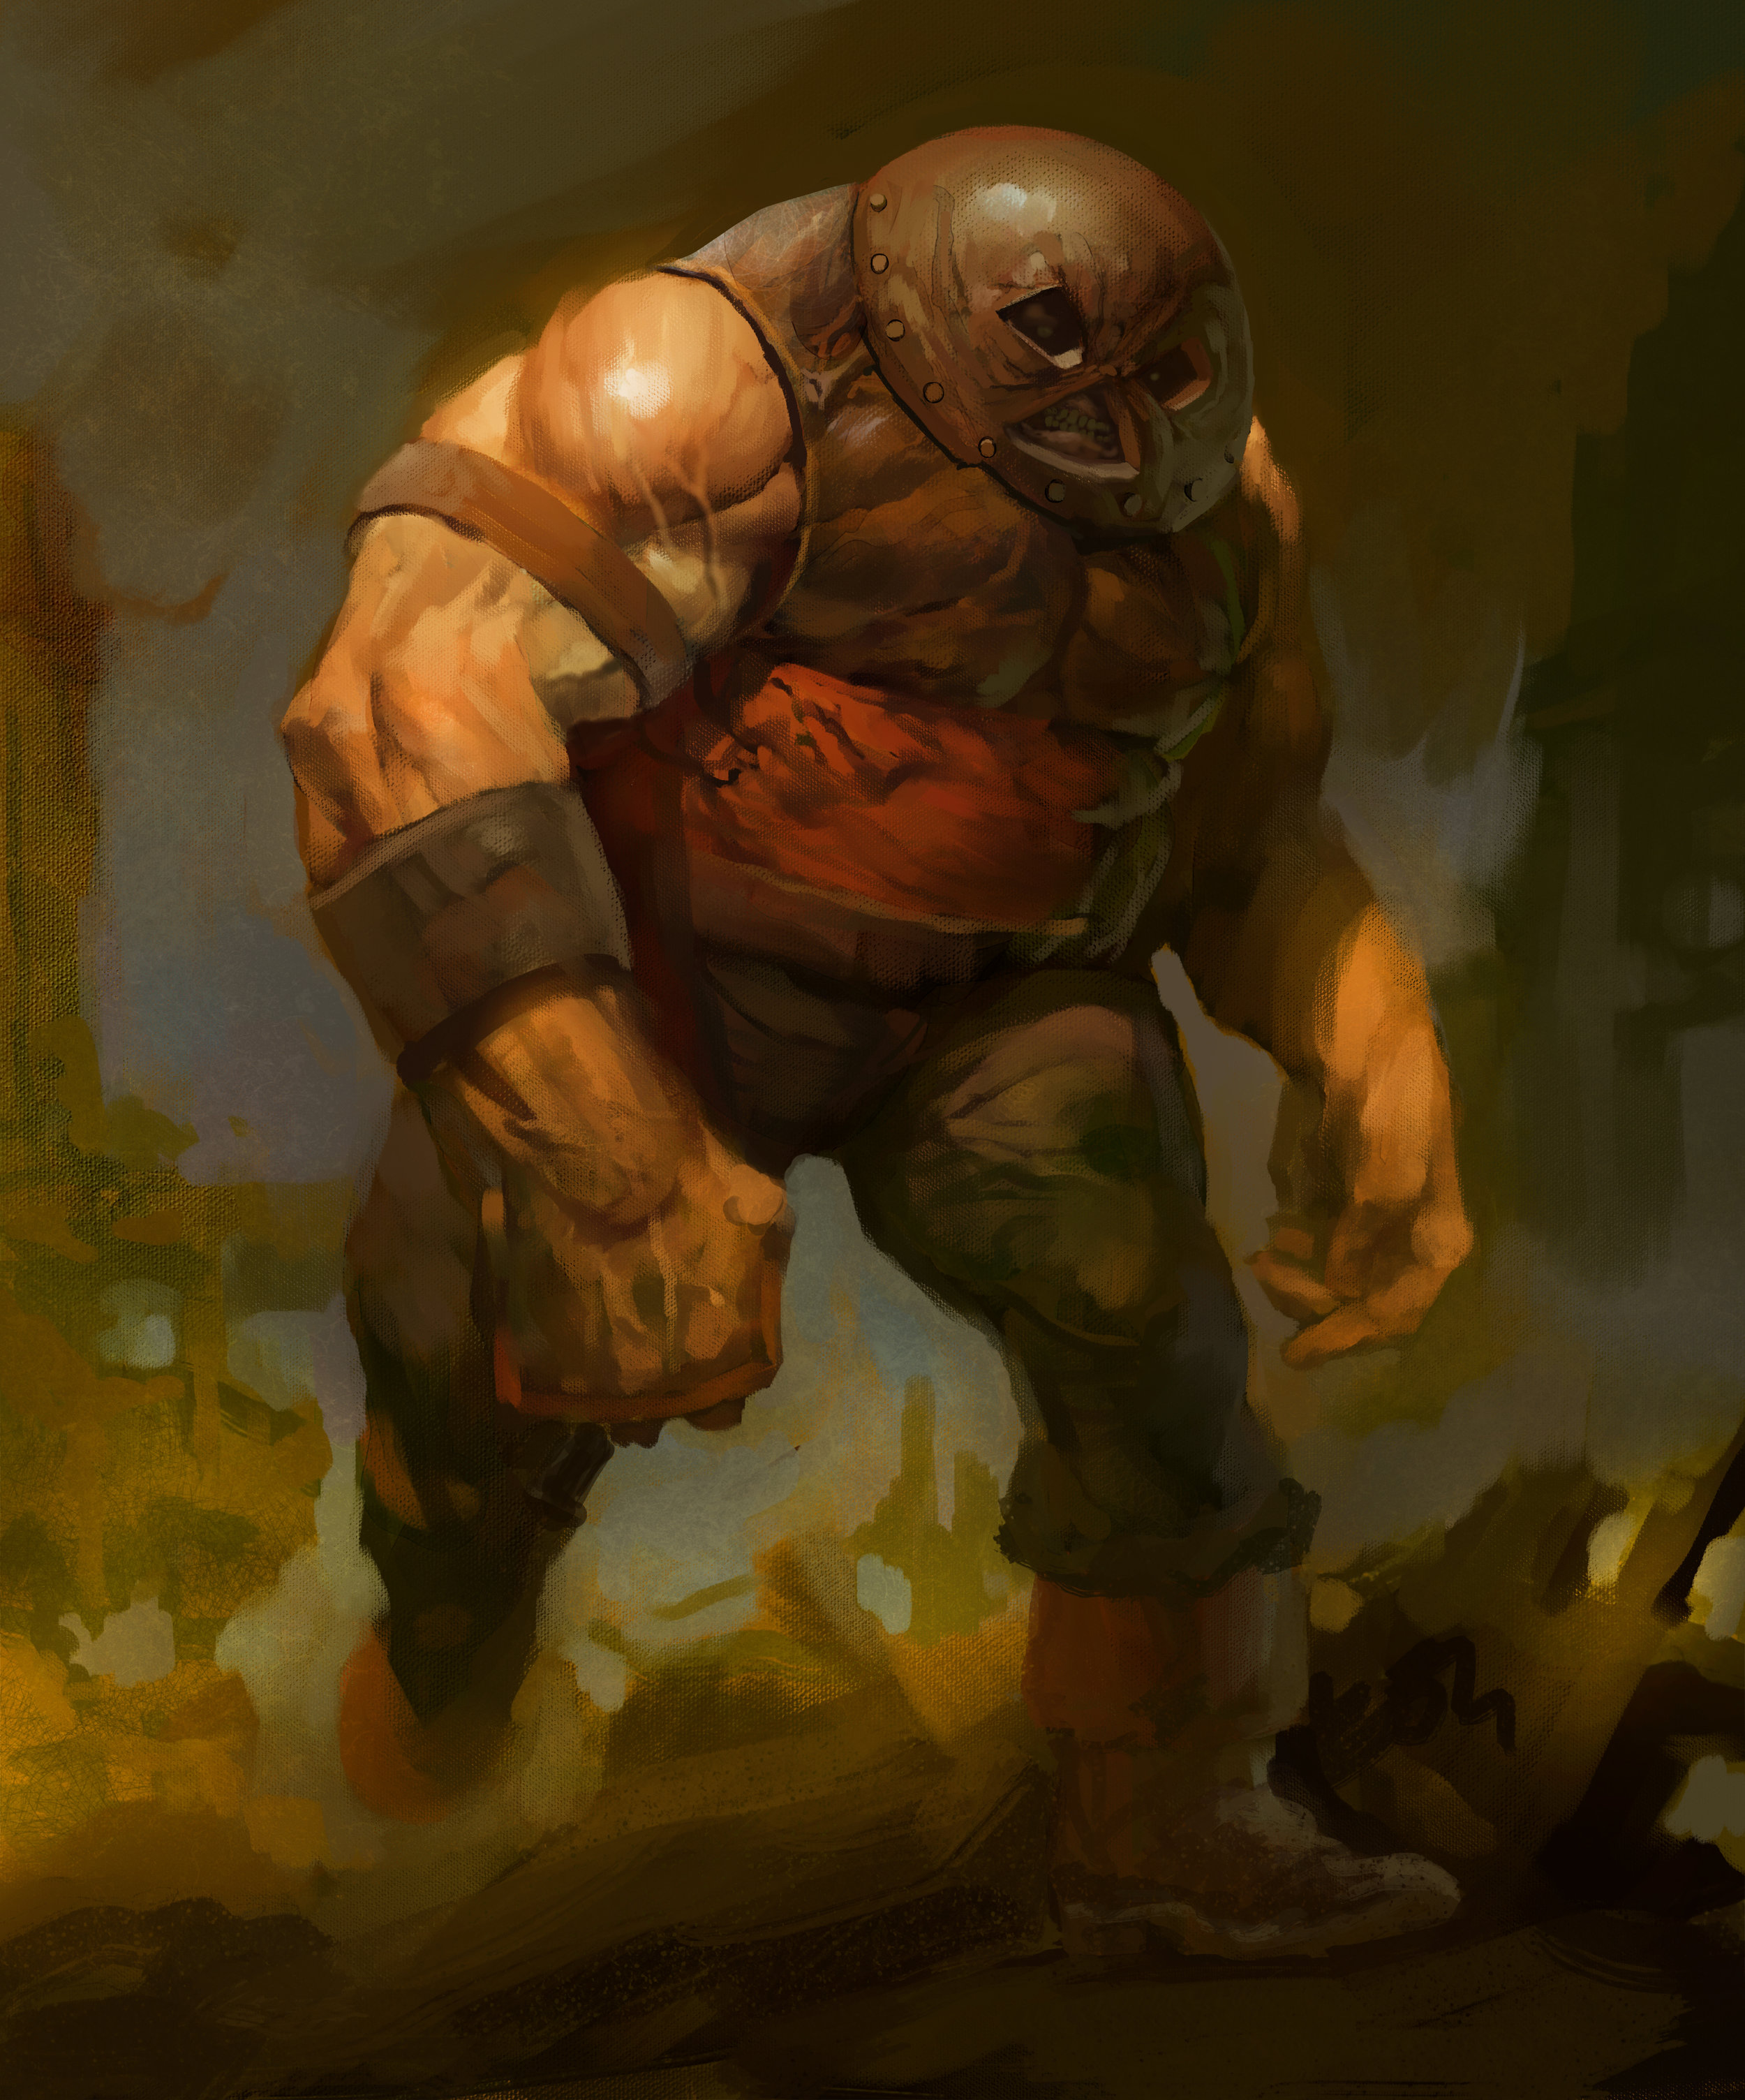 Juggernaut_01_001212.jpg